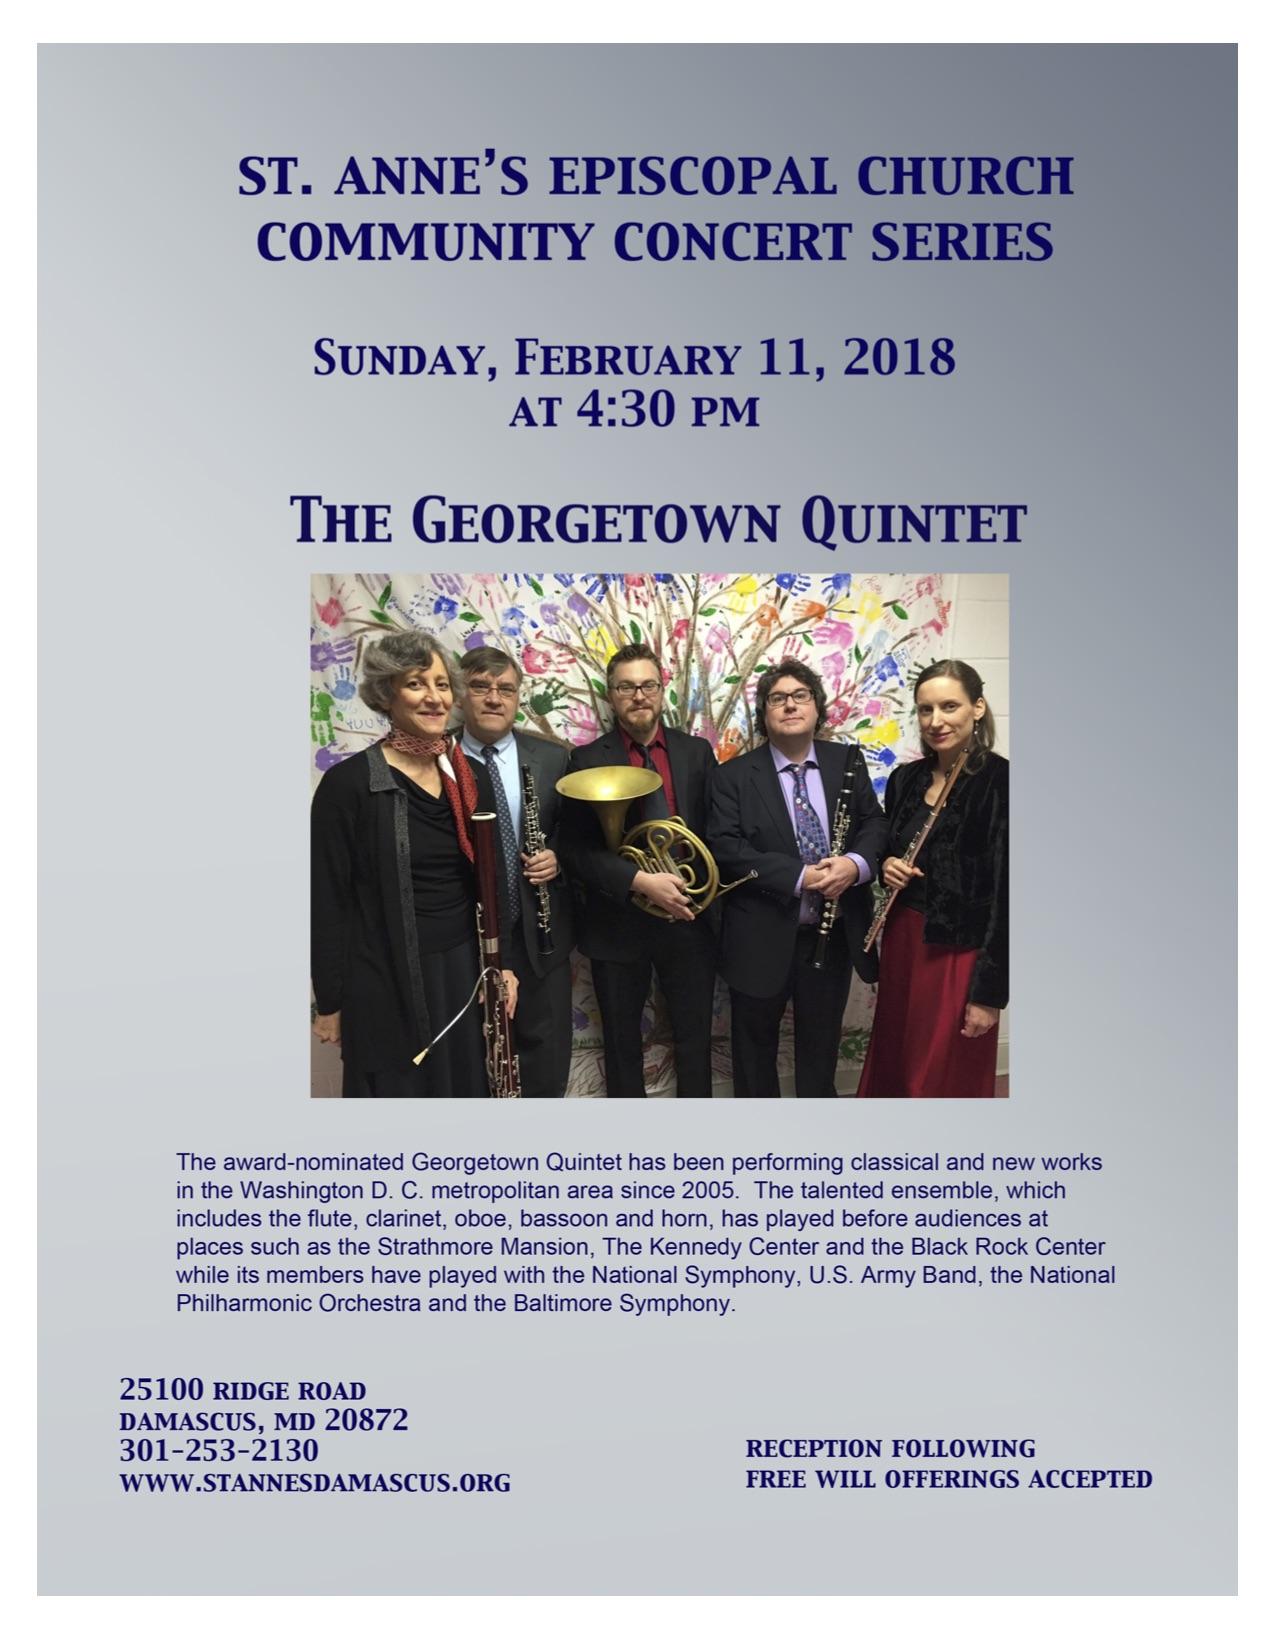 The Georgetown Quintet 2.jpg